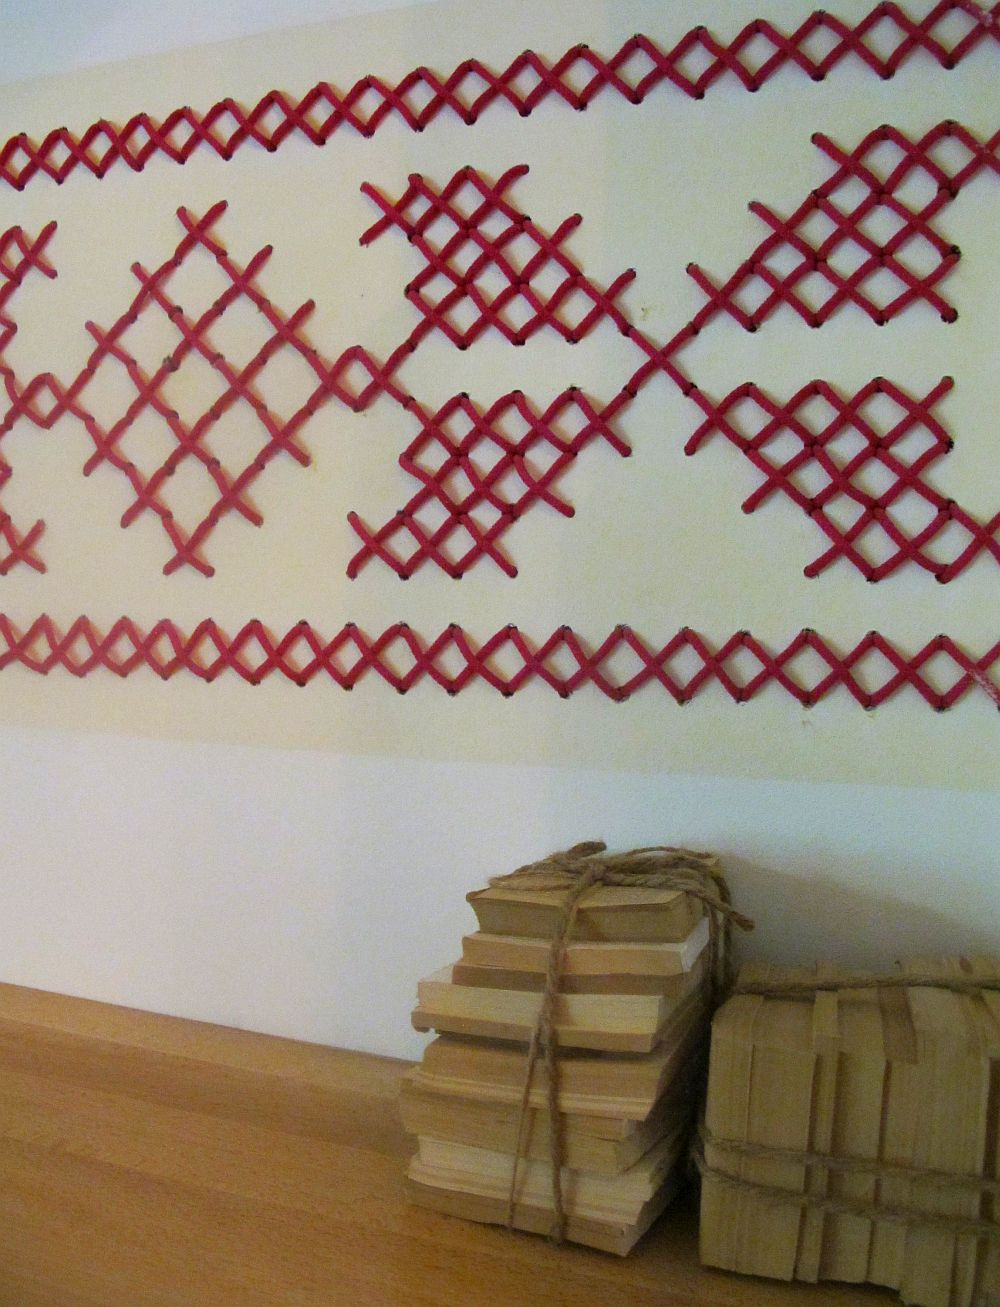 adelaparvu.com despre La Copac, design Interior Mihai Grama (17)